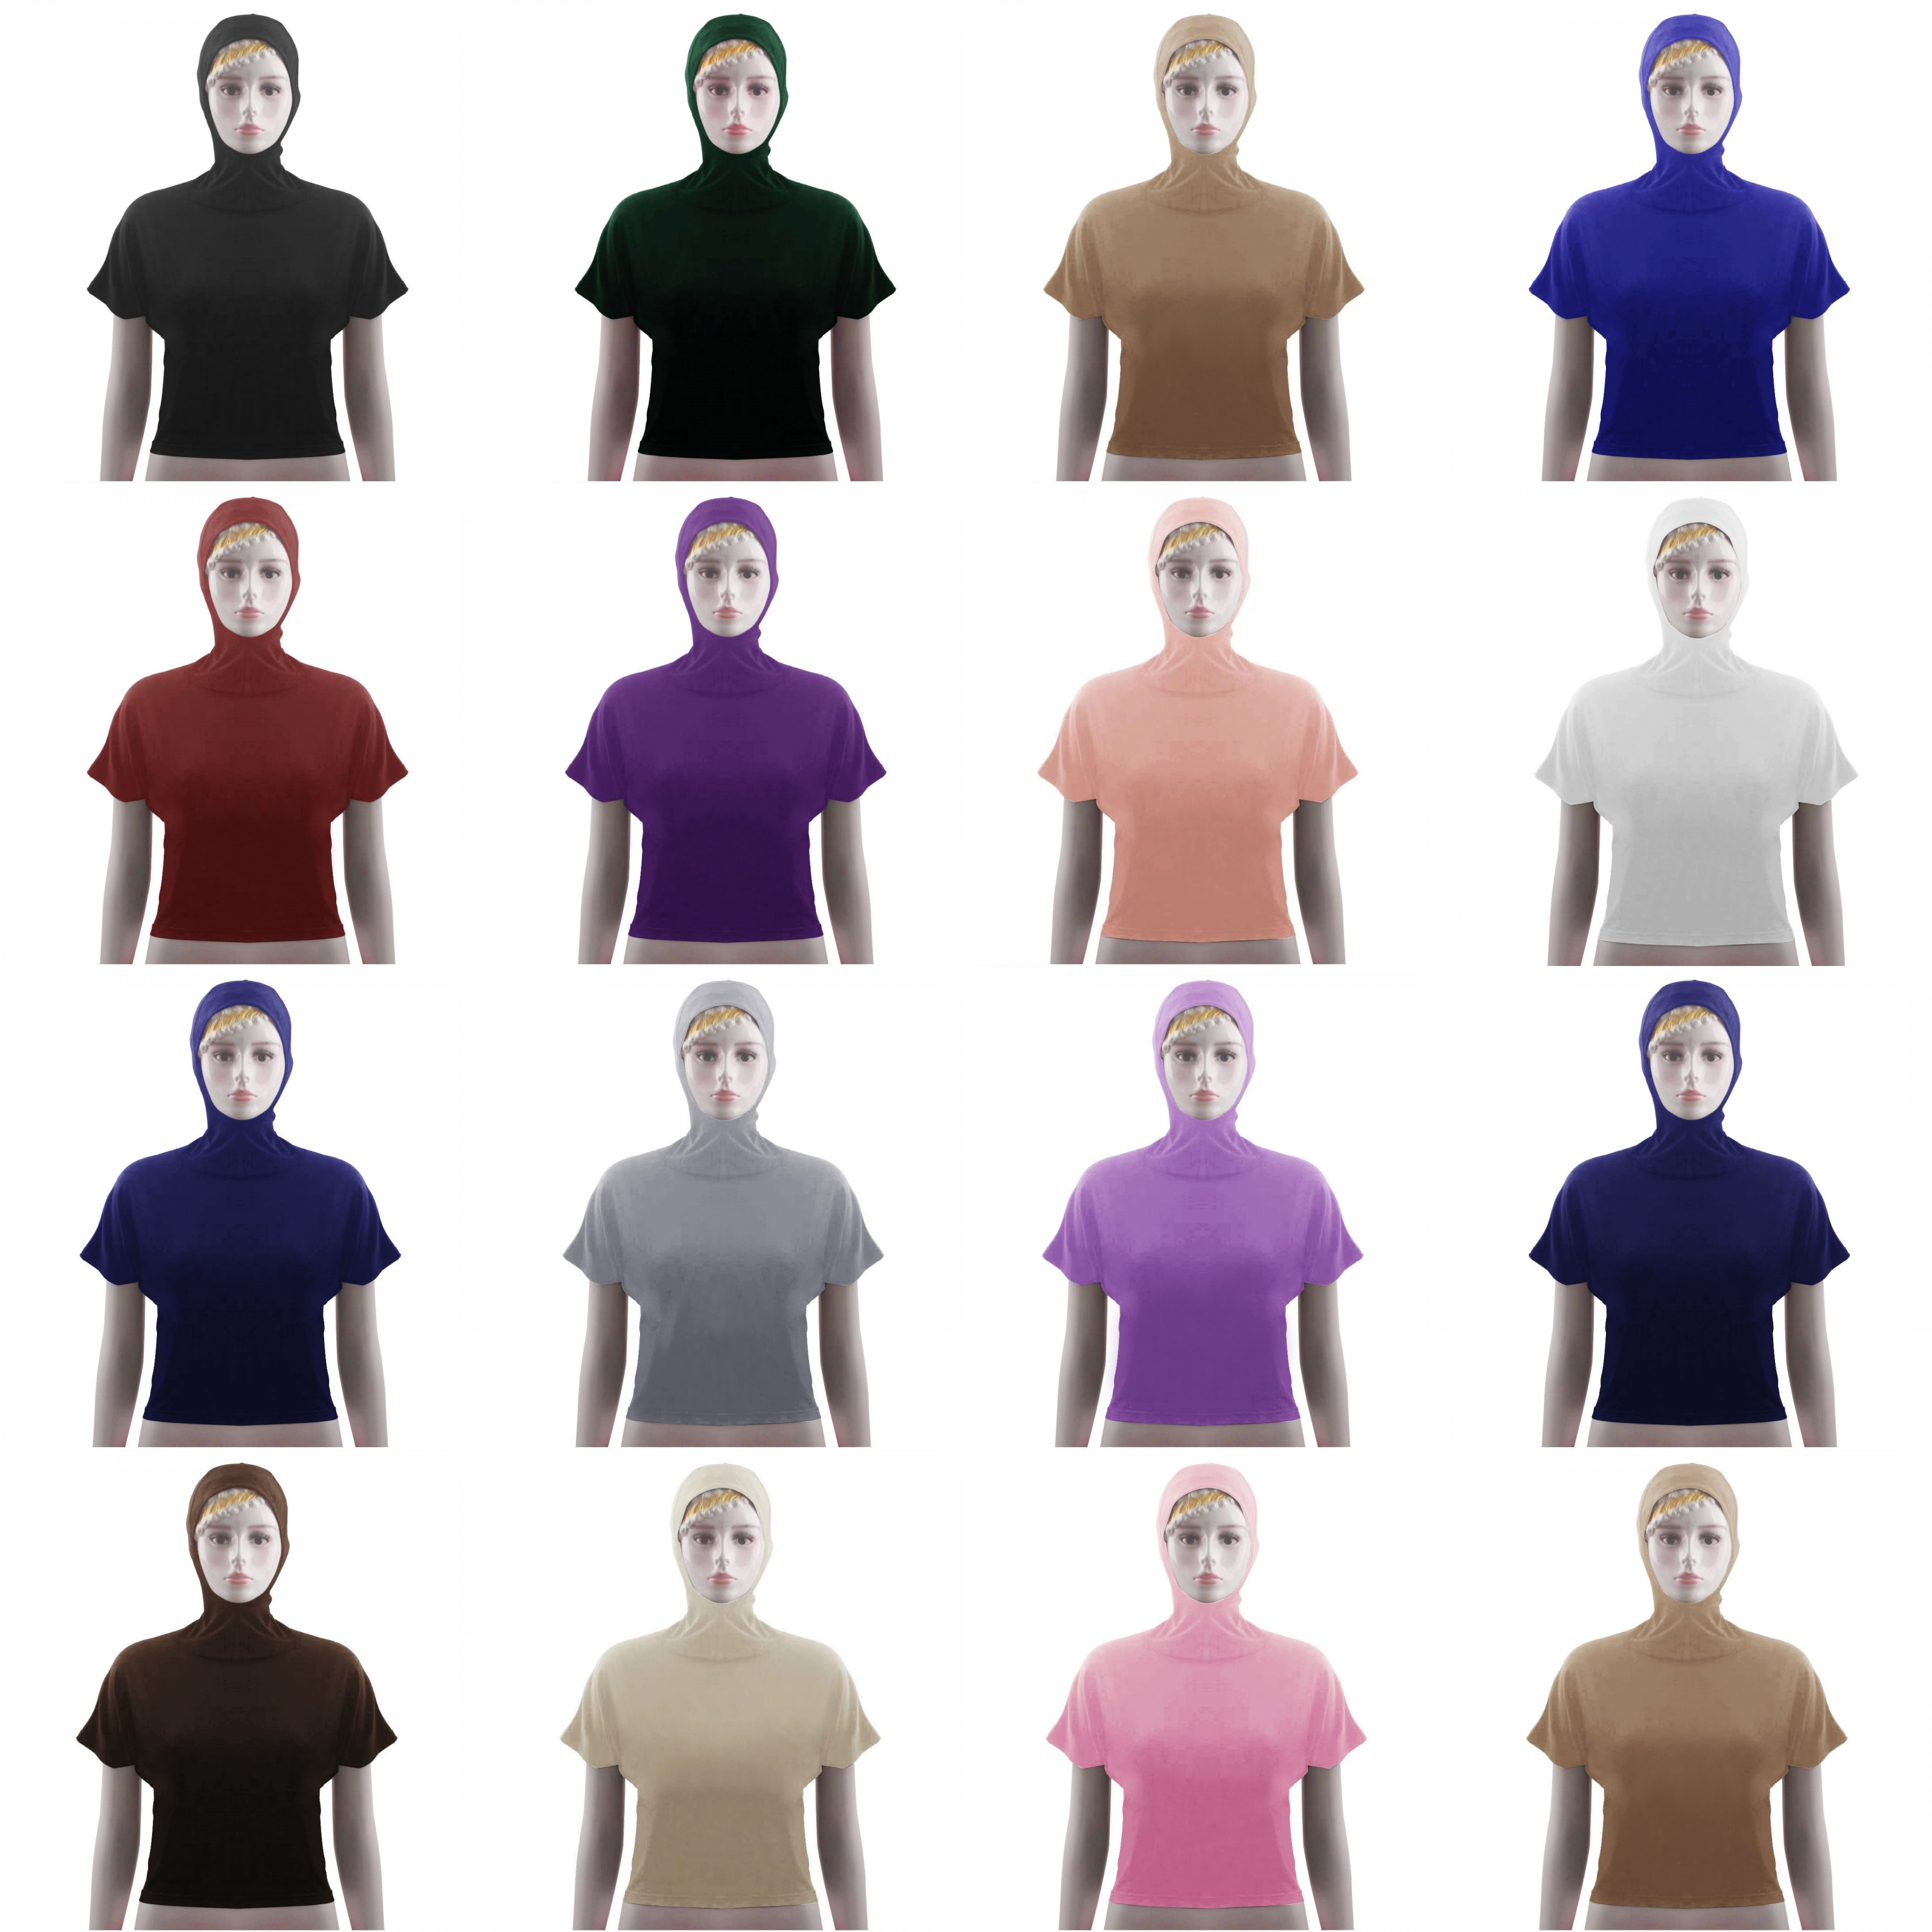 Dromiya Plain Women Muslim Top Hooded Sunscreen Crop Tops Short Sleeve Blouse Stretch Beach Wear Swimwear Neck Chest Full Cover